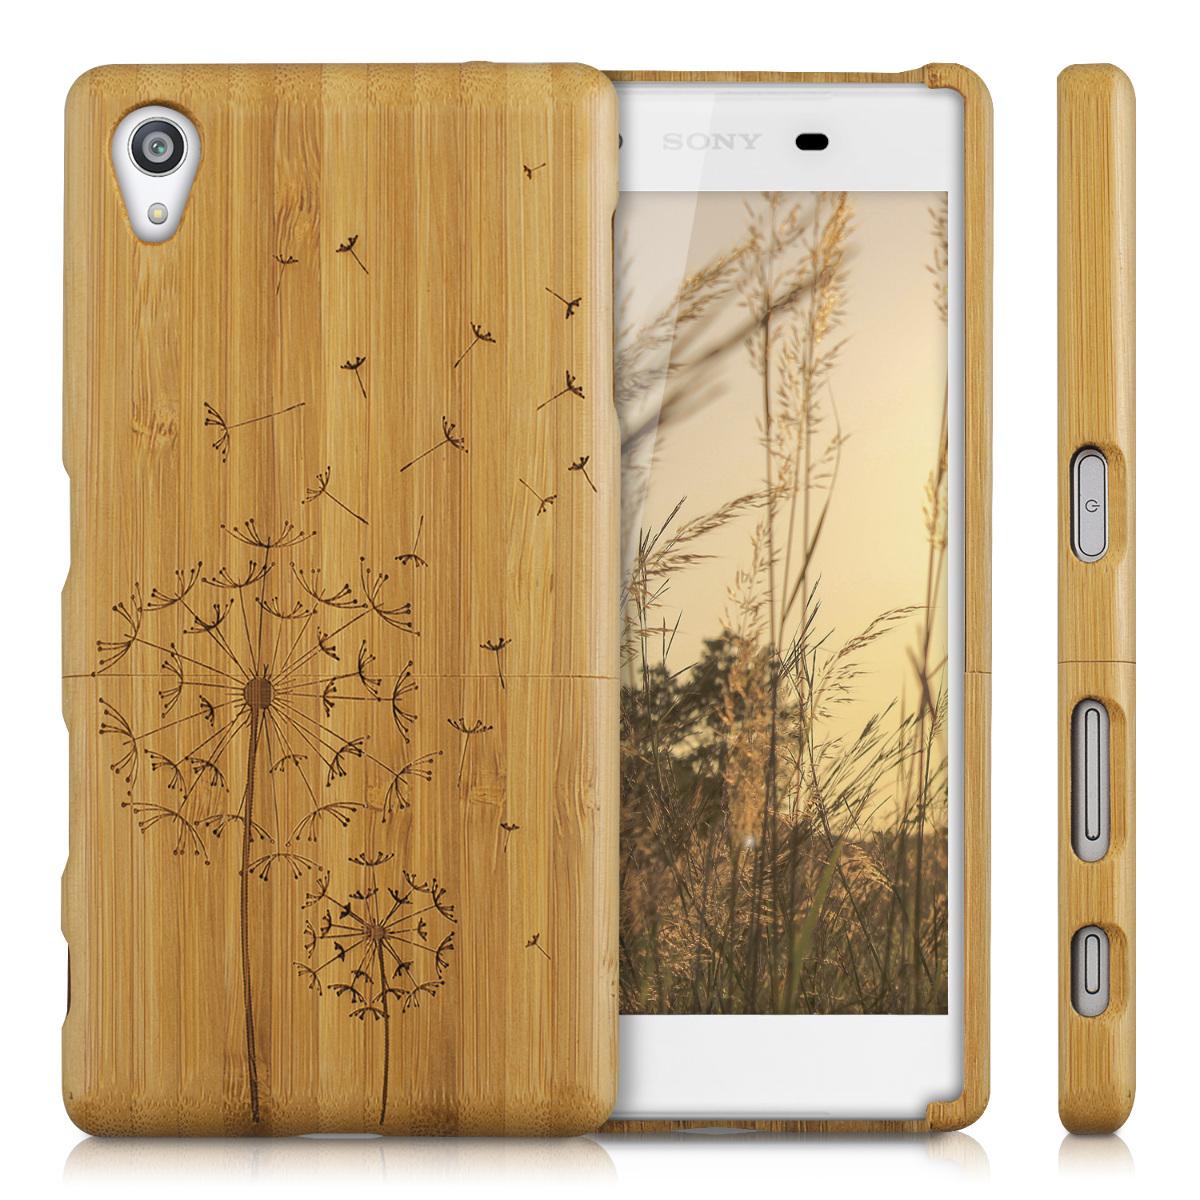 Natural-Madera-de-Bambu-Estuche-Cubierta-Para-Sony-Xperia-Z5